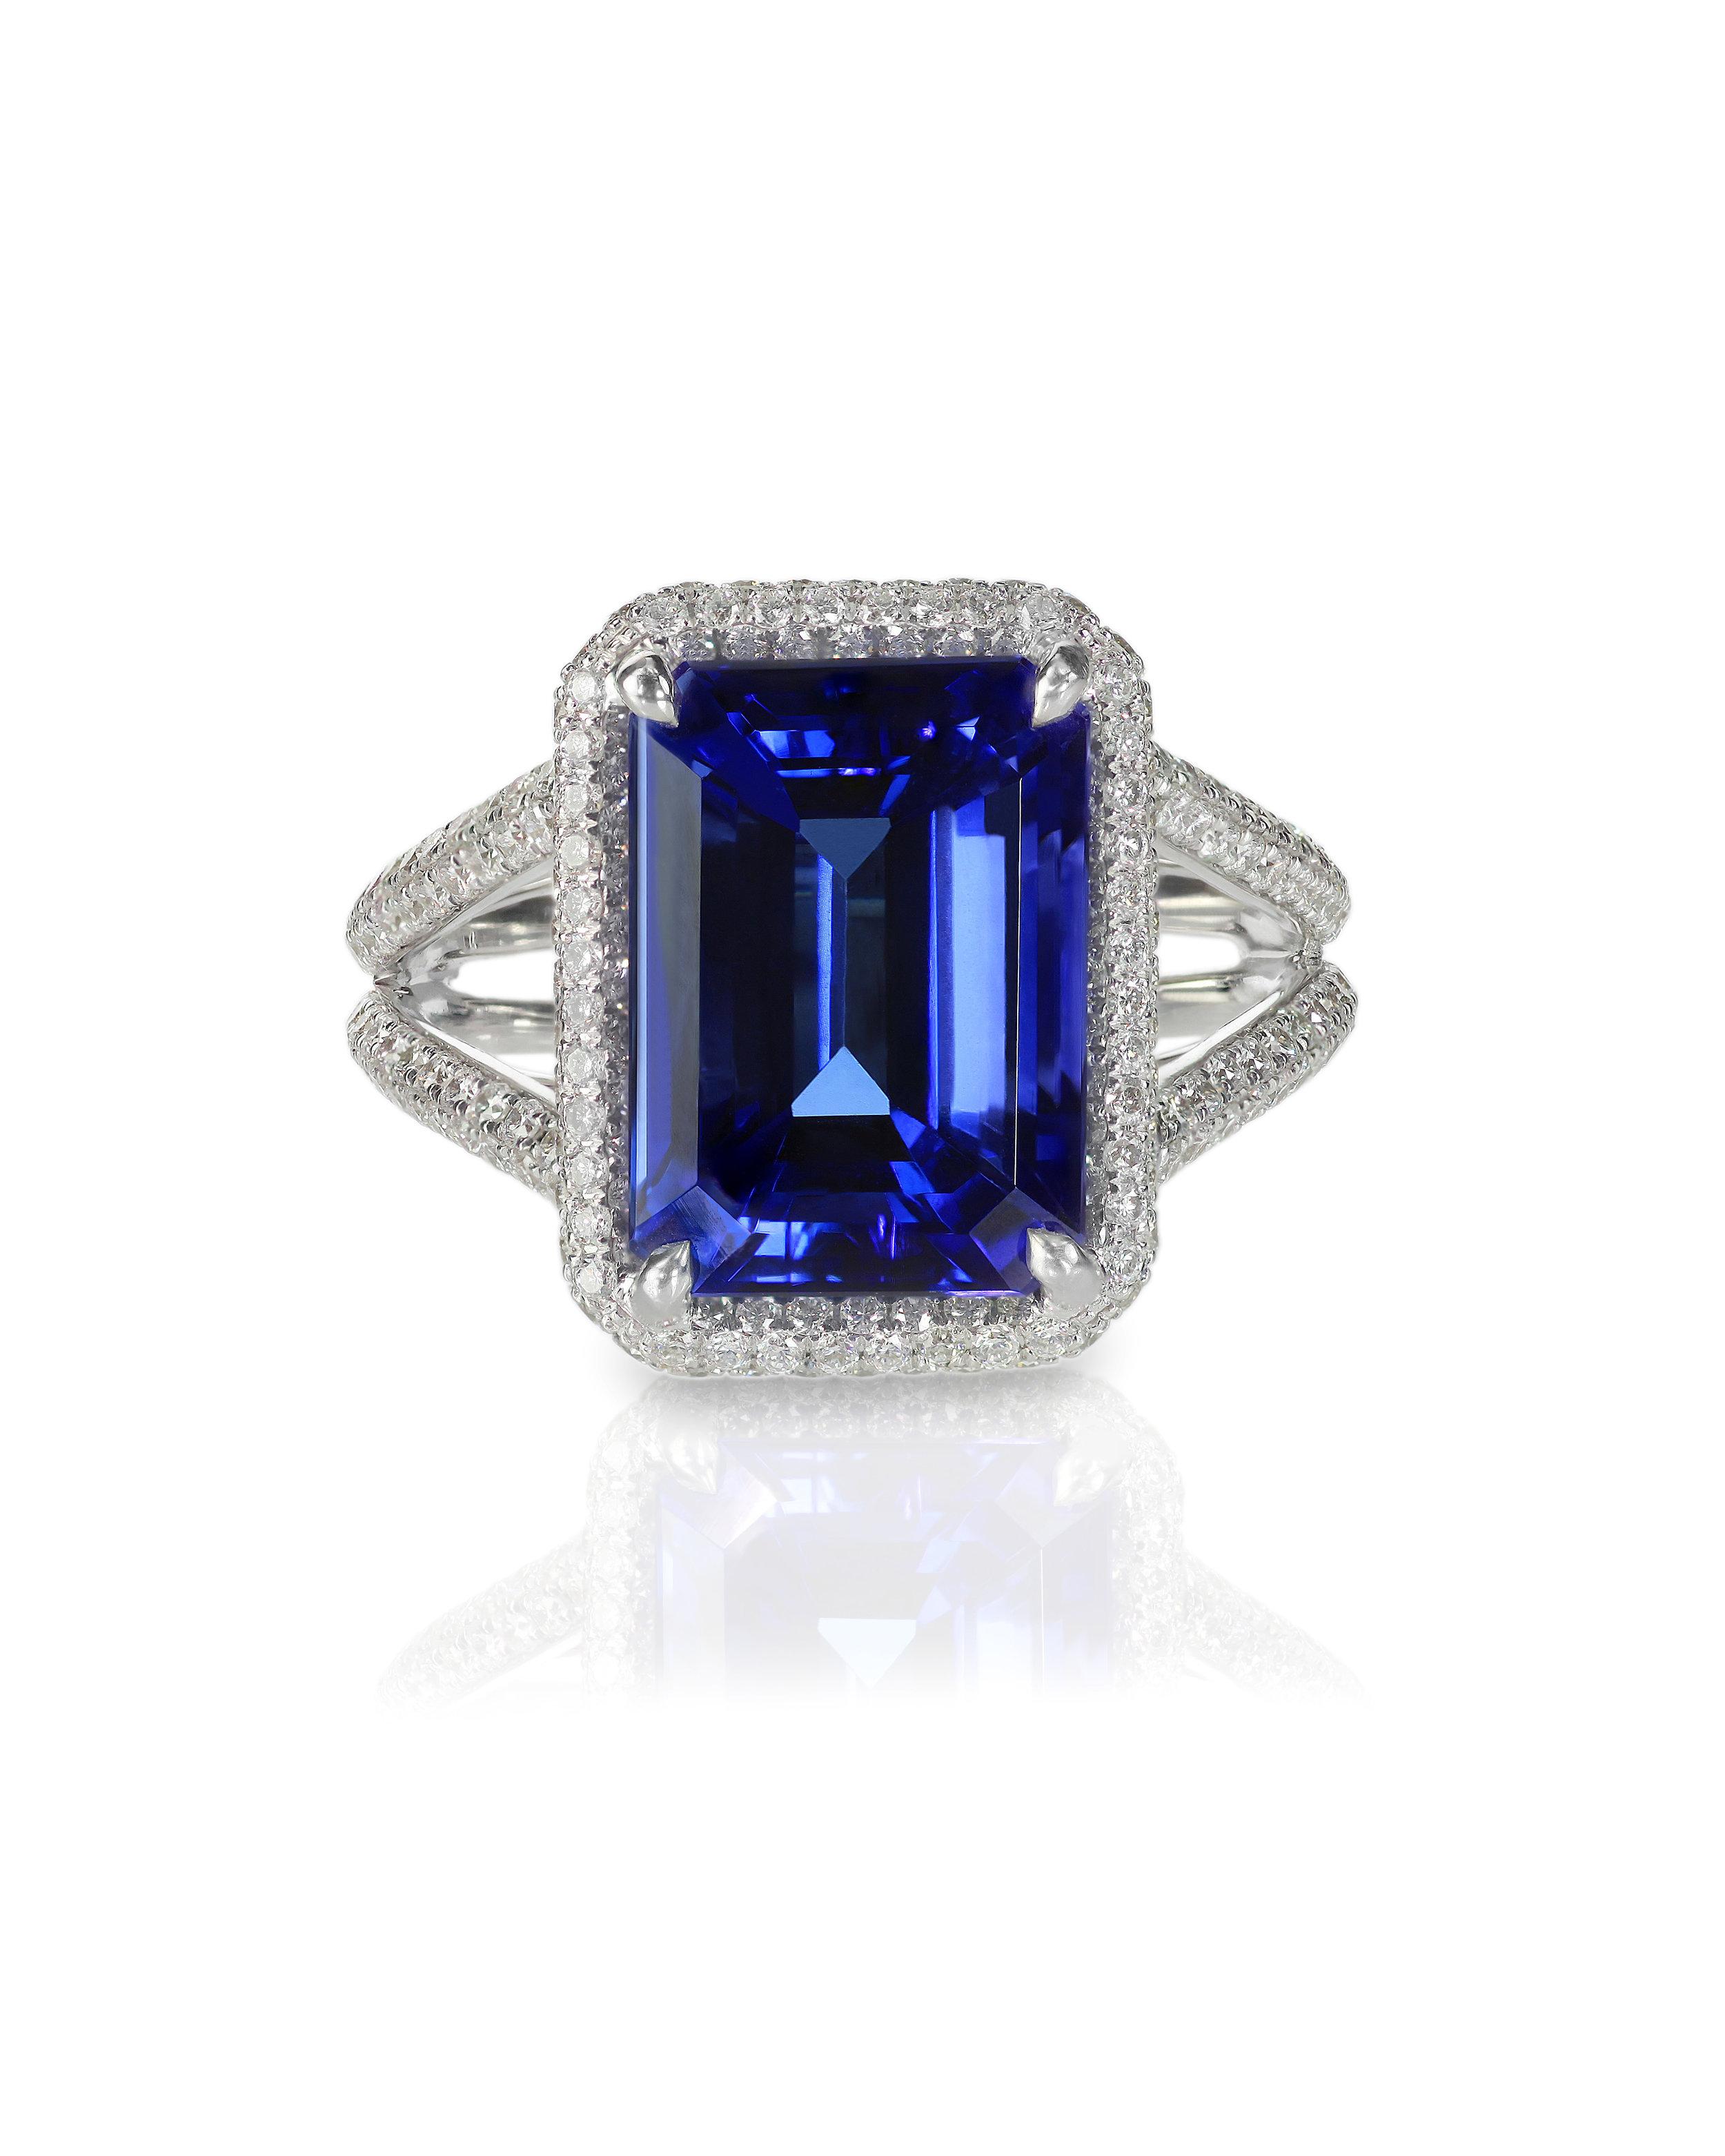 Emerald Cut Blue Sapphire Diamond Ring